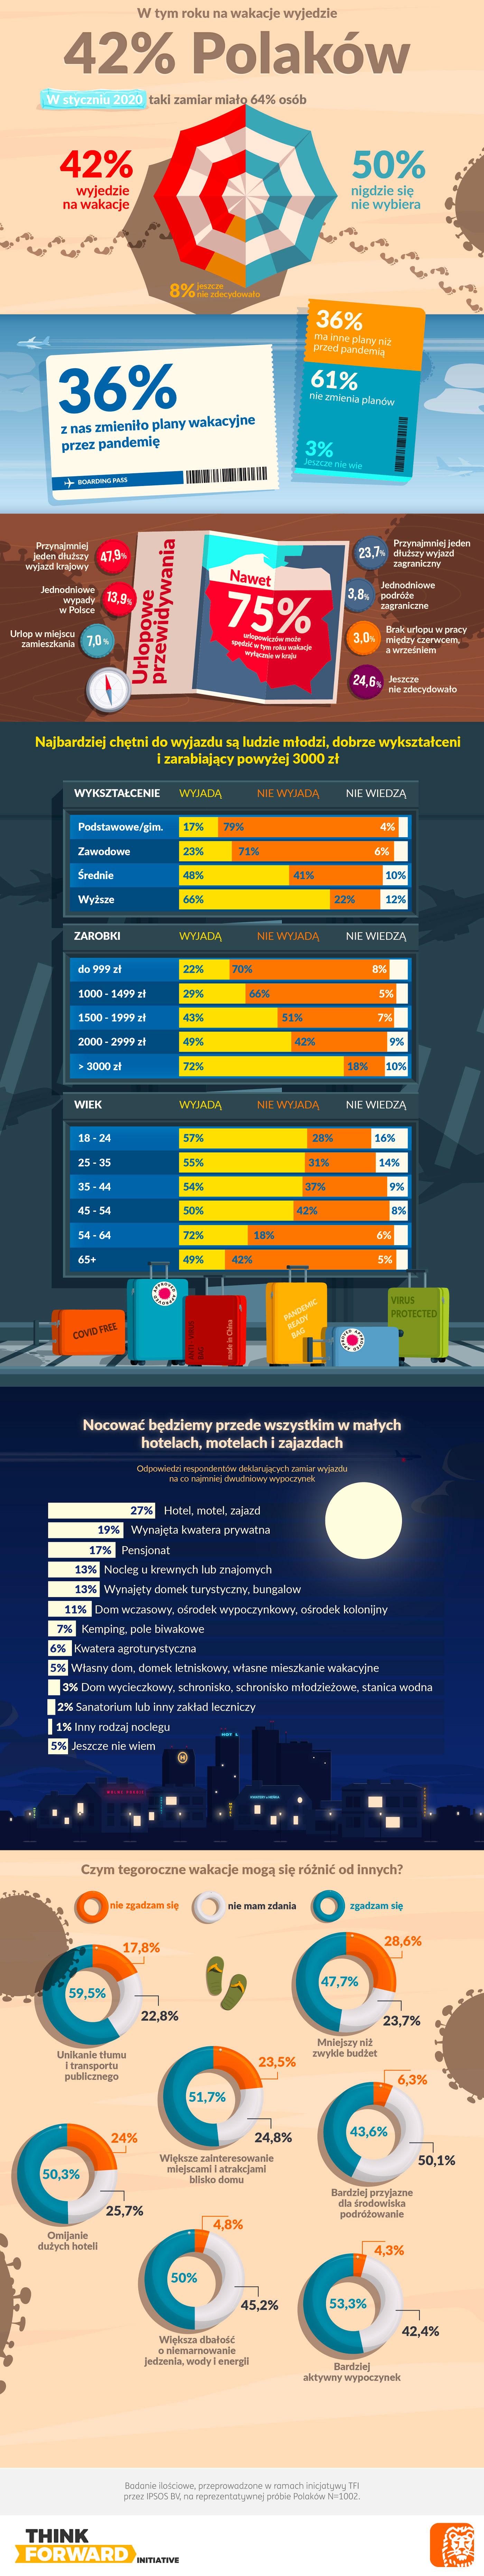 ING-wakacje-2020-infografika.jpg